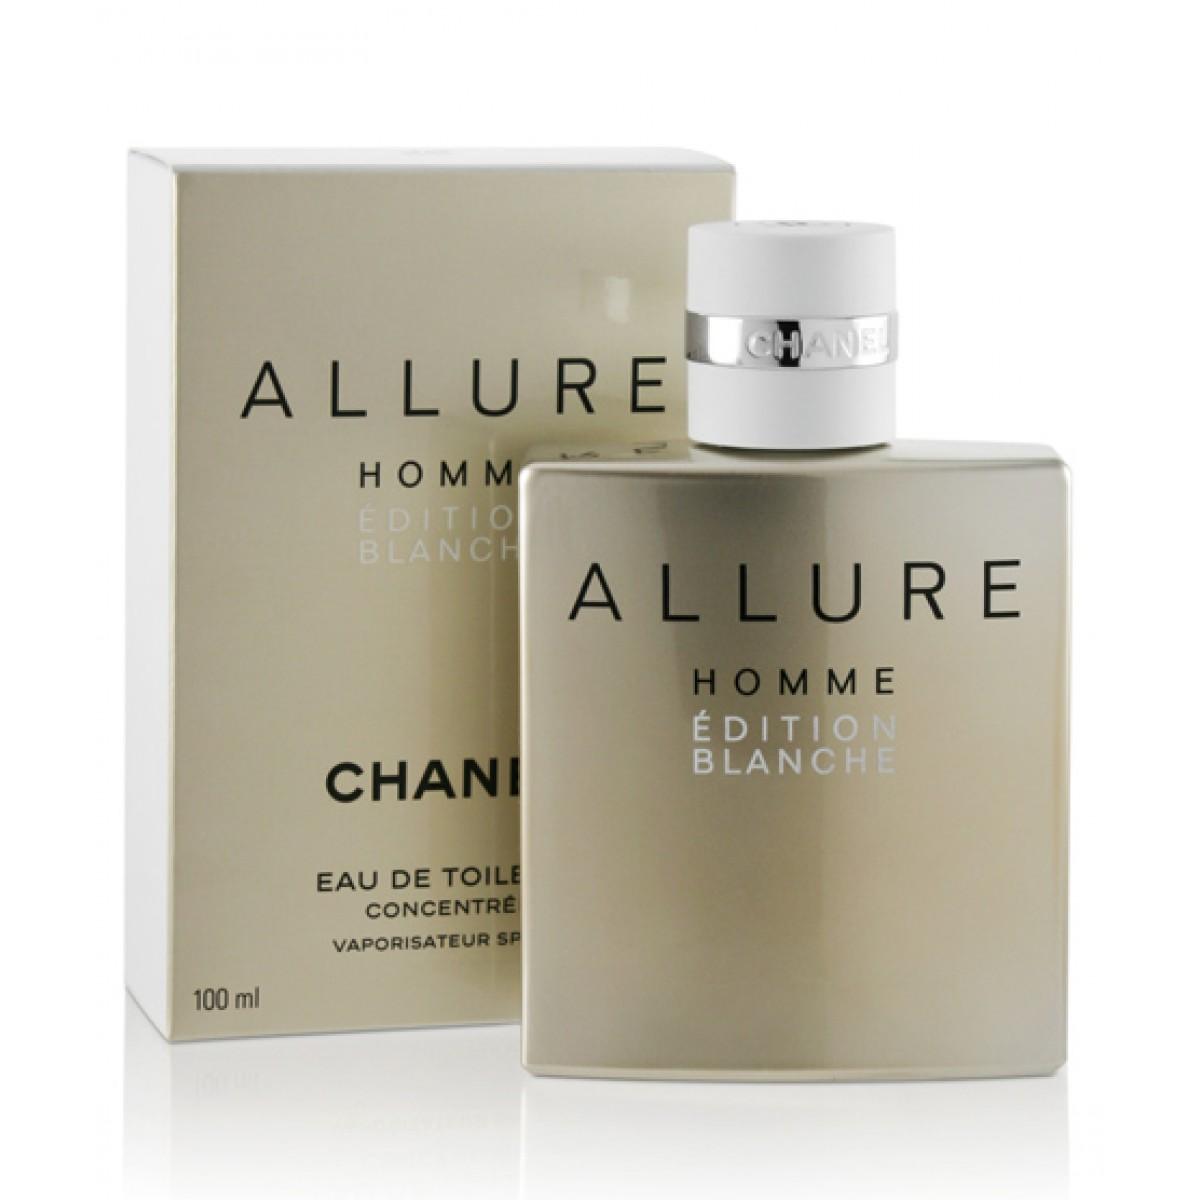 Chanel Allure Homme Edition Blanche Eau De Toilette Price In